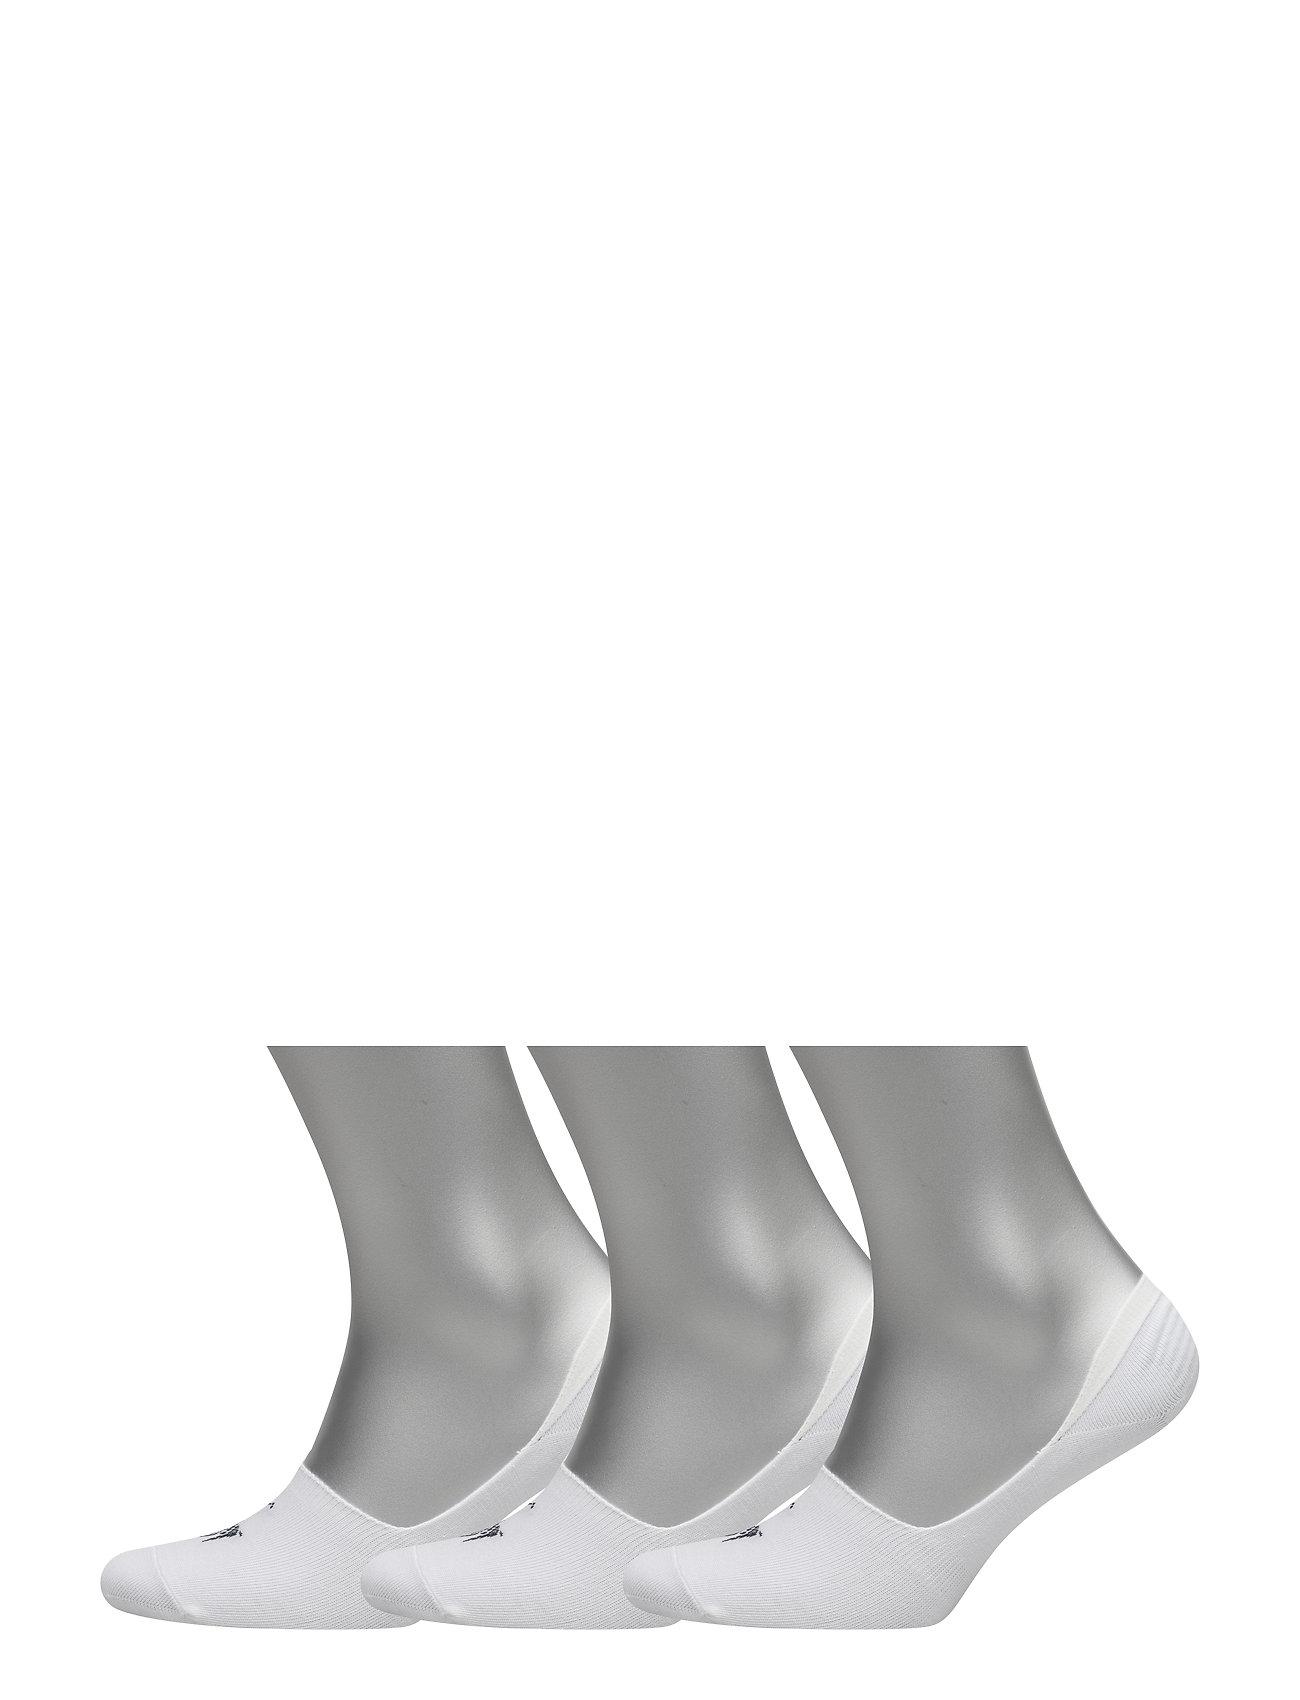 Polo Ralph Lauren Underwear LT WT LINER-NO SHOW-3 PACK